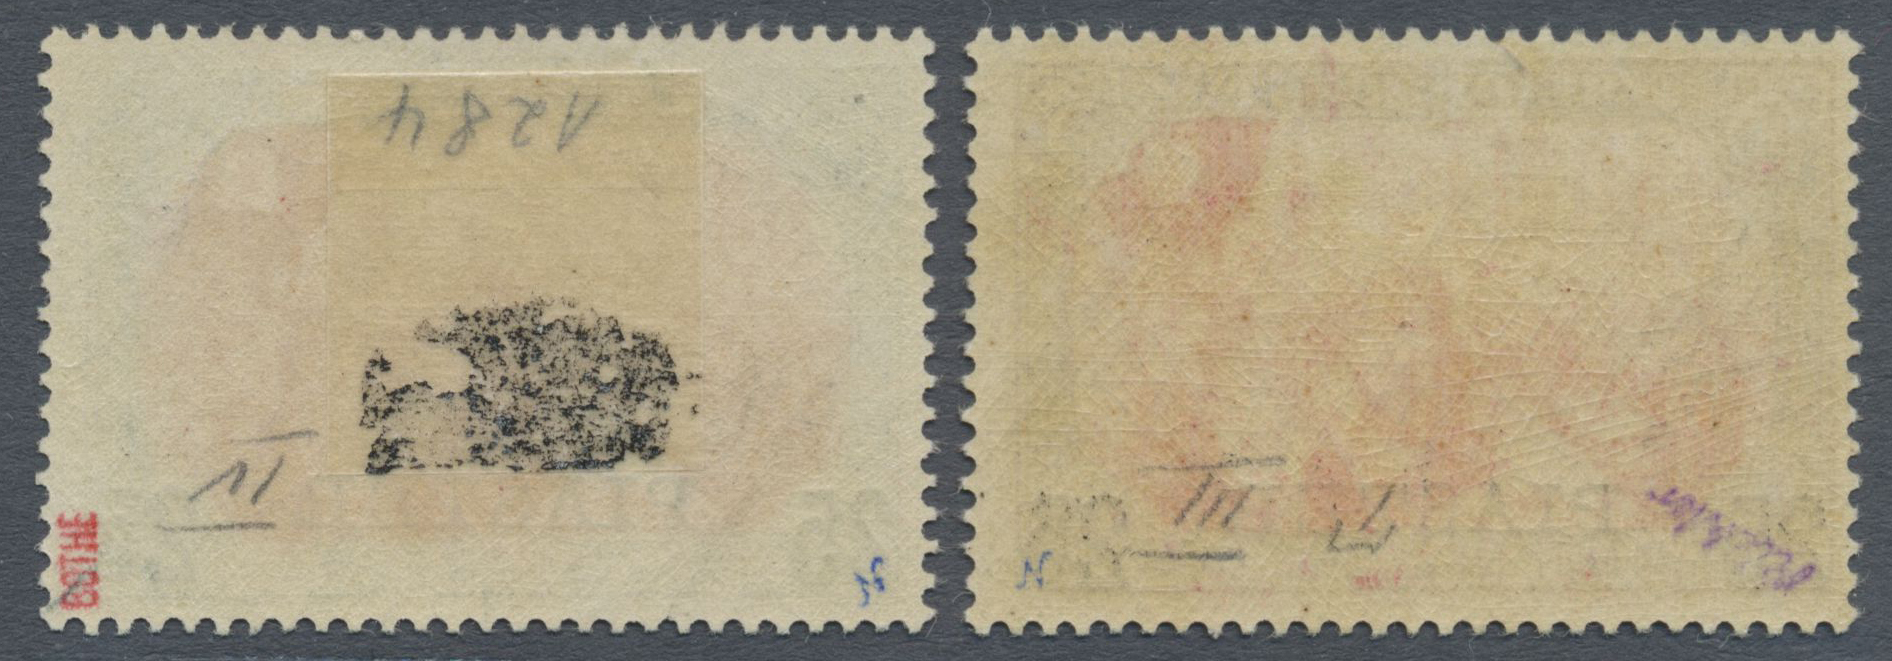 Lot 22134 - deutsche post in der türkei  -  Auktionshaus Christoph Gärtner GmbH & Co. KG Single lots Germany + Picture Postcards. Auction #39 Day 5